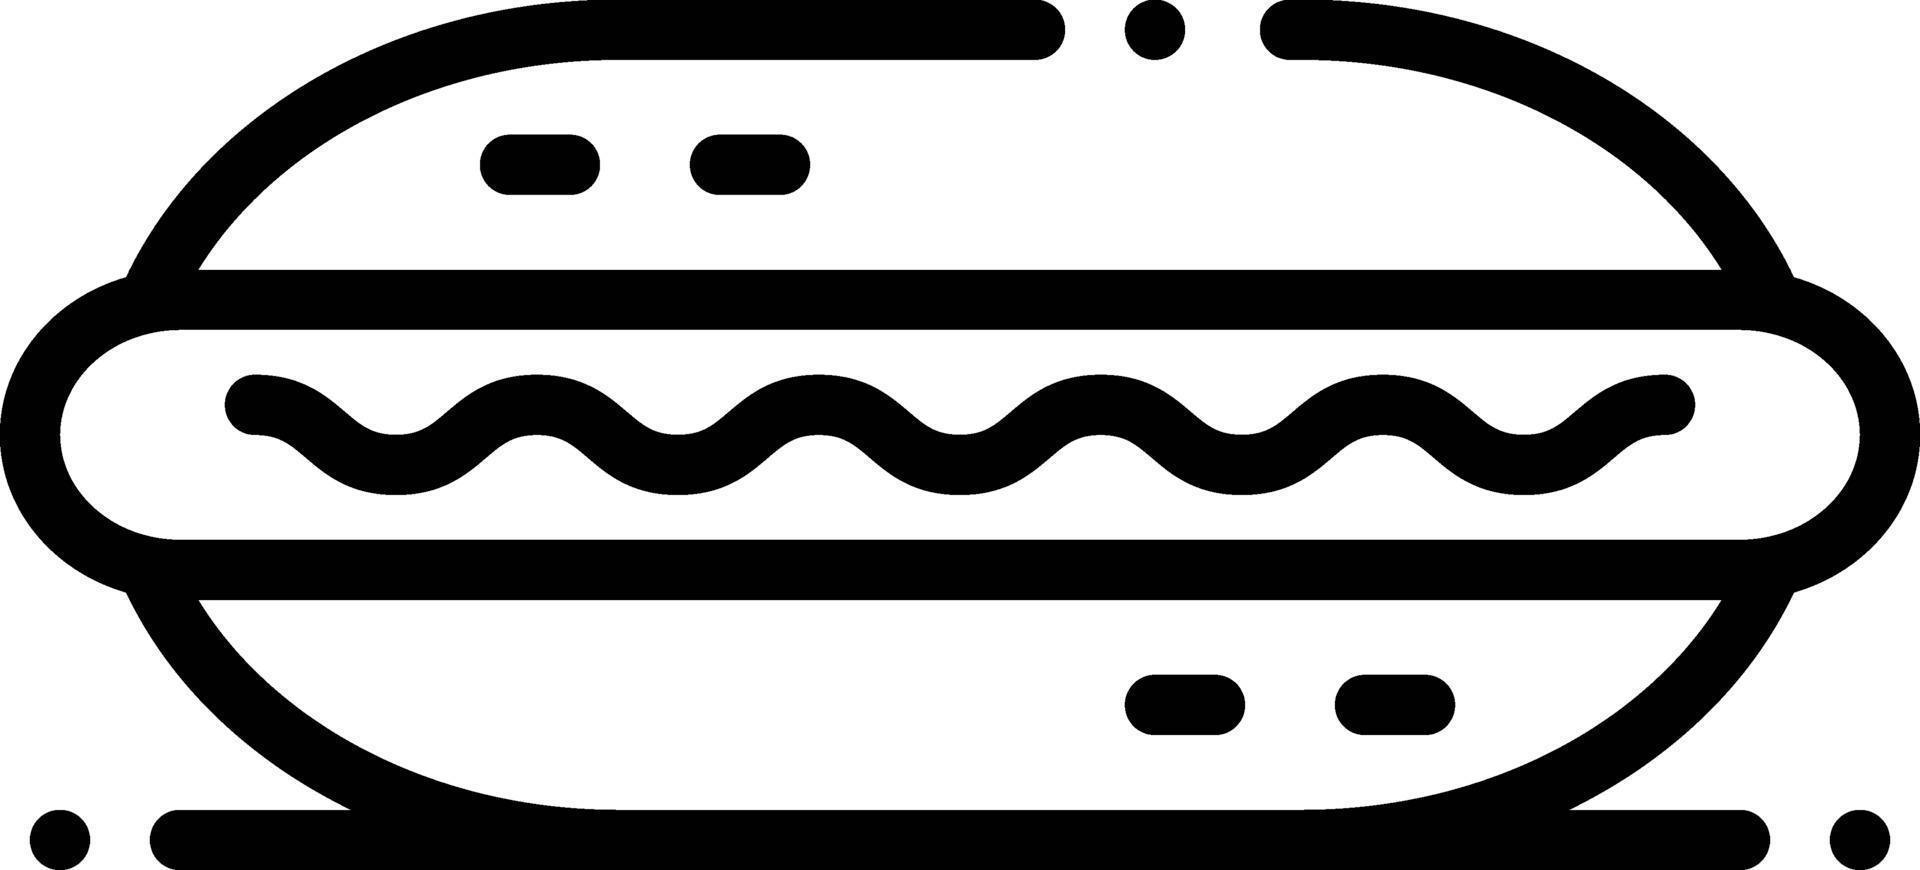 Liniensymbol für Hot Dog vektor